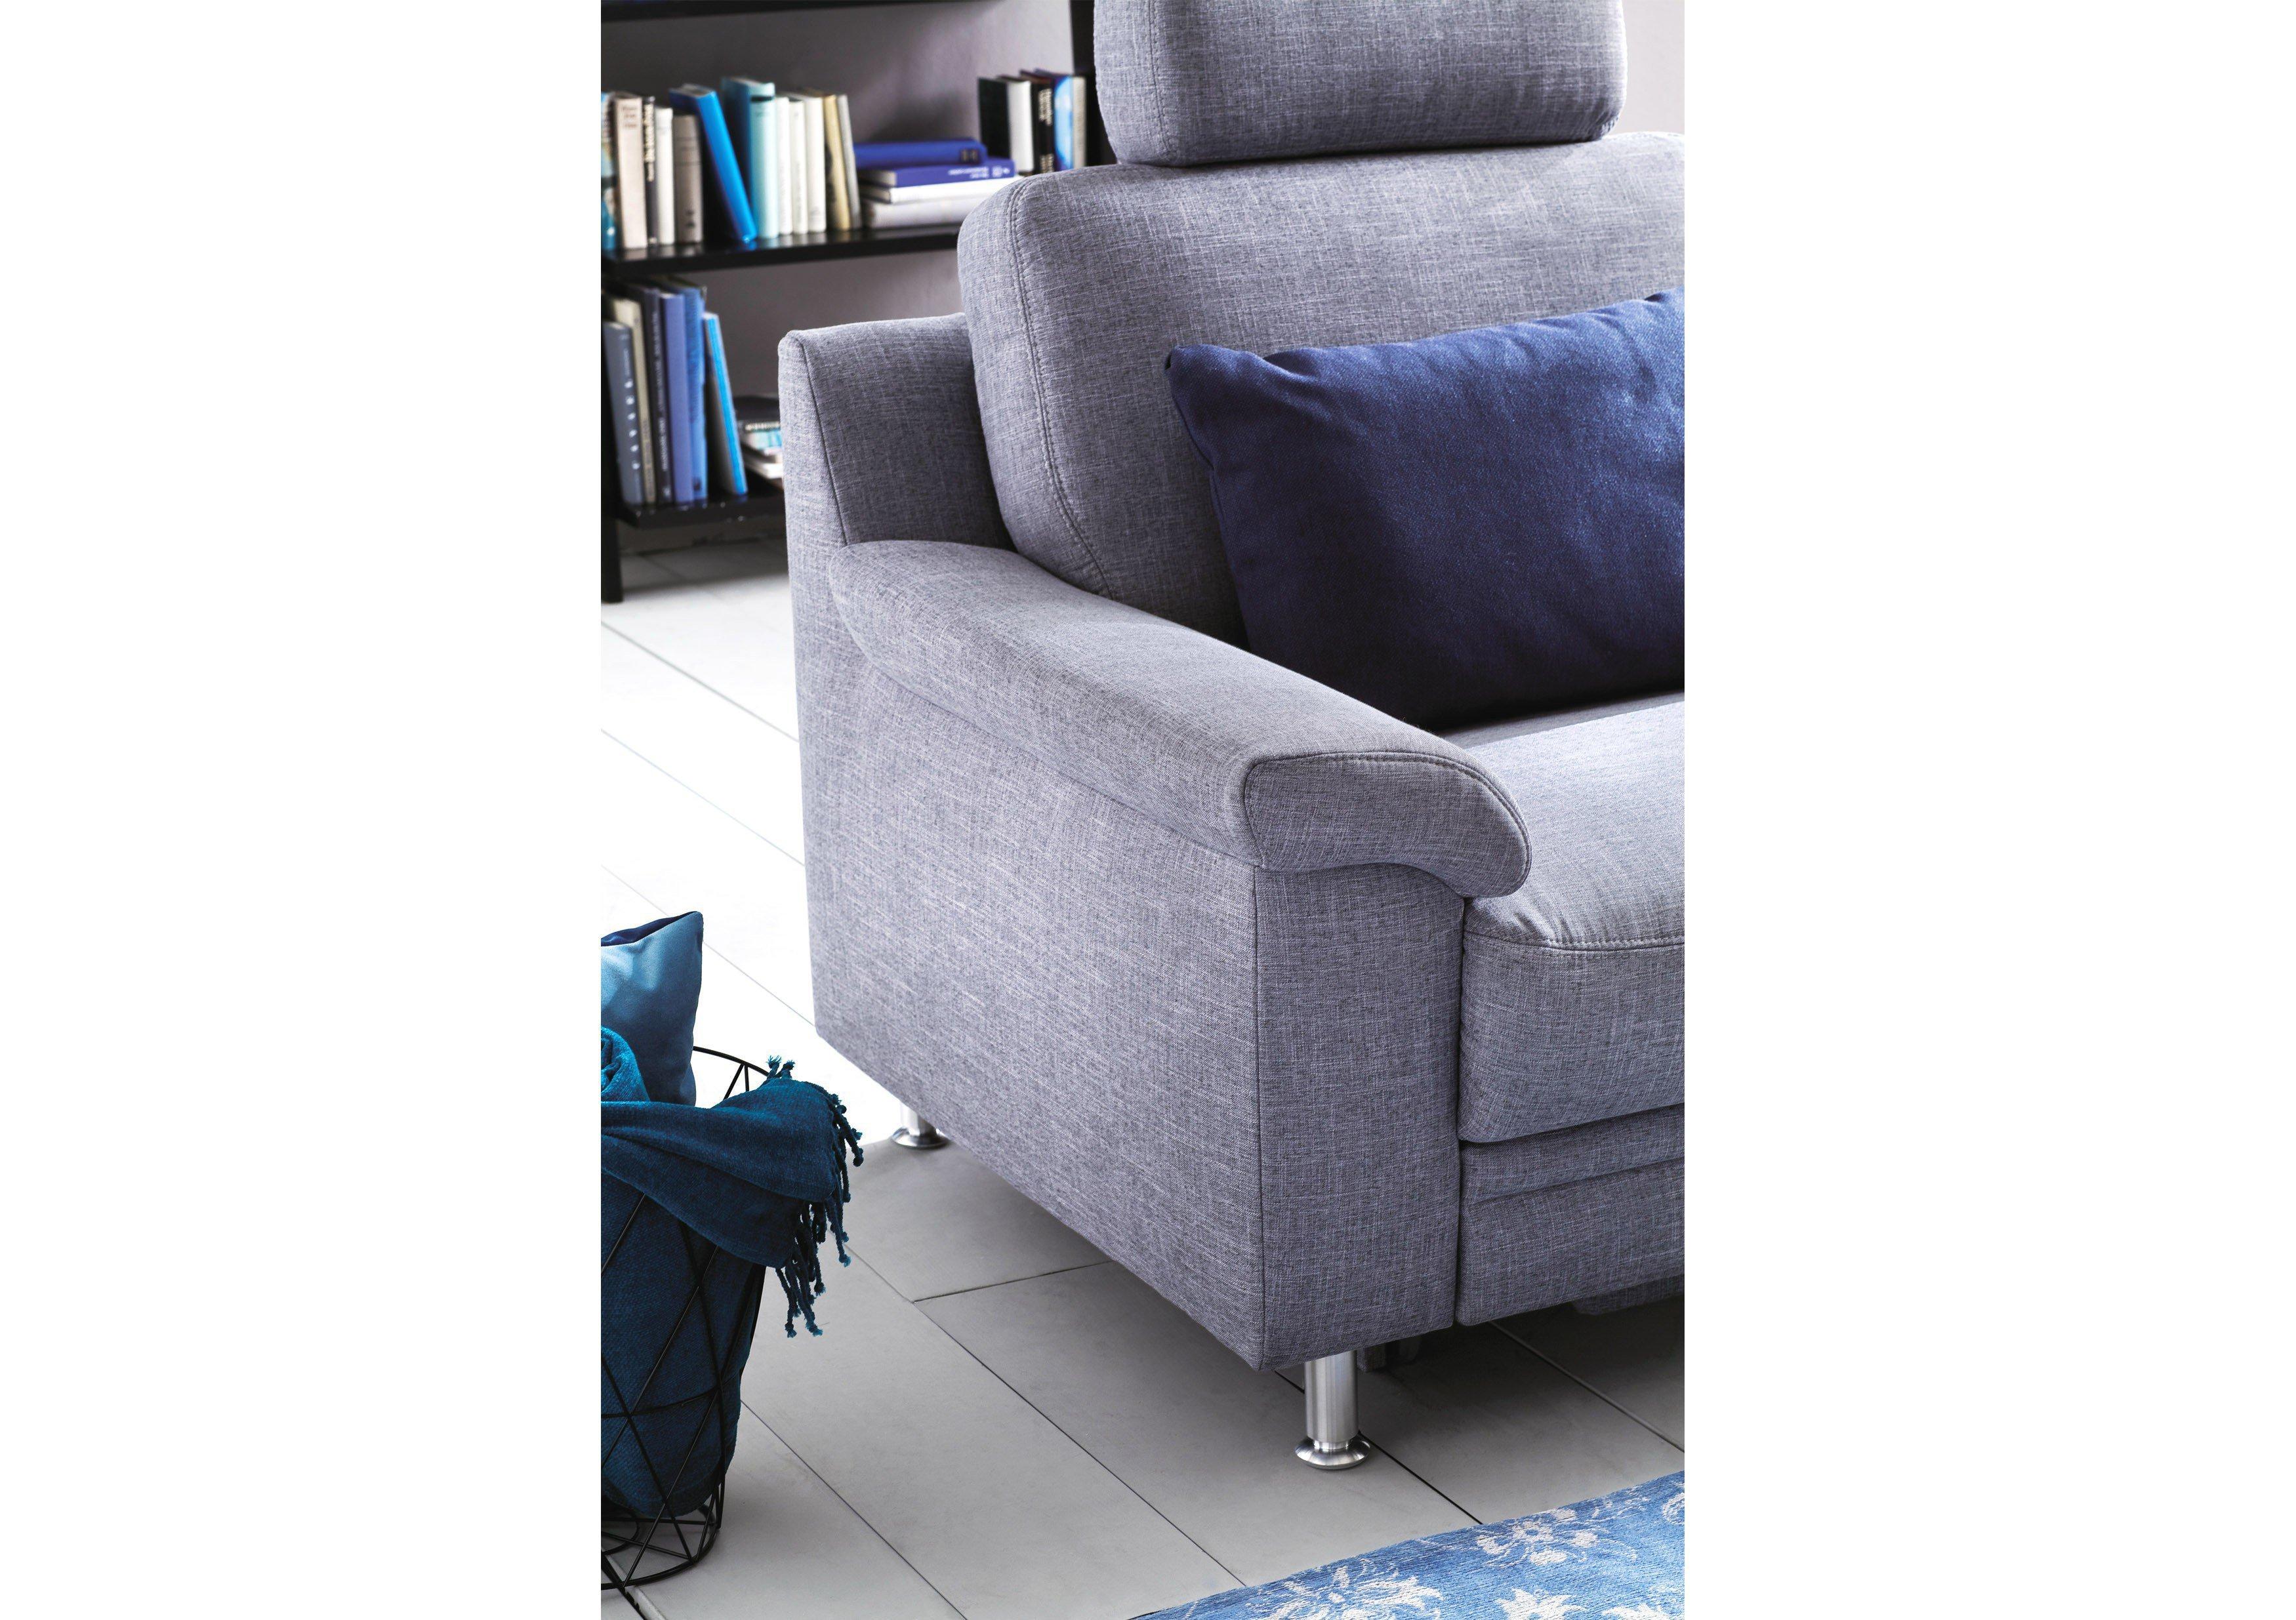 carina polsterm bel cora eckgarnitur in hellgrau m bel. Black Bedroom Furniture Sets. Home Design Ideas